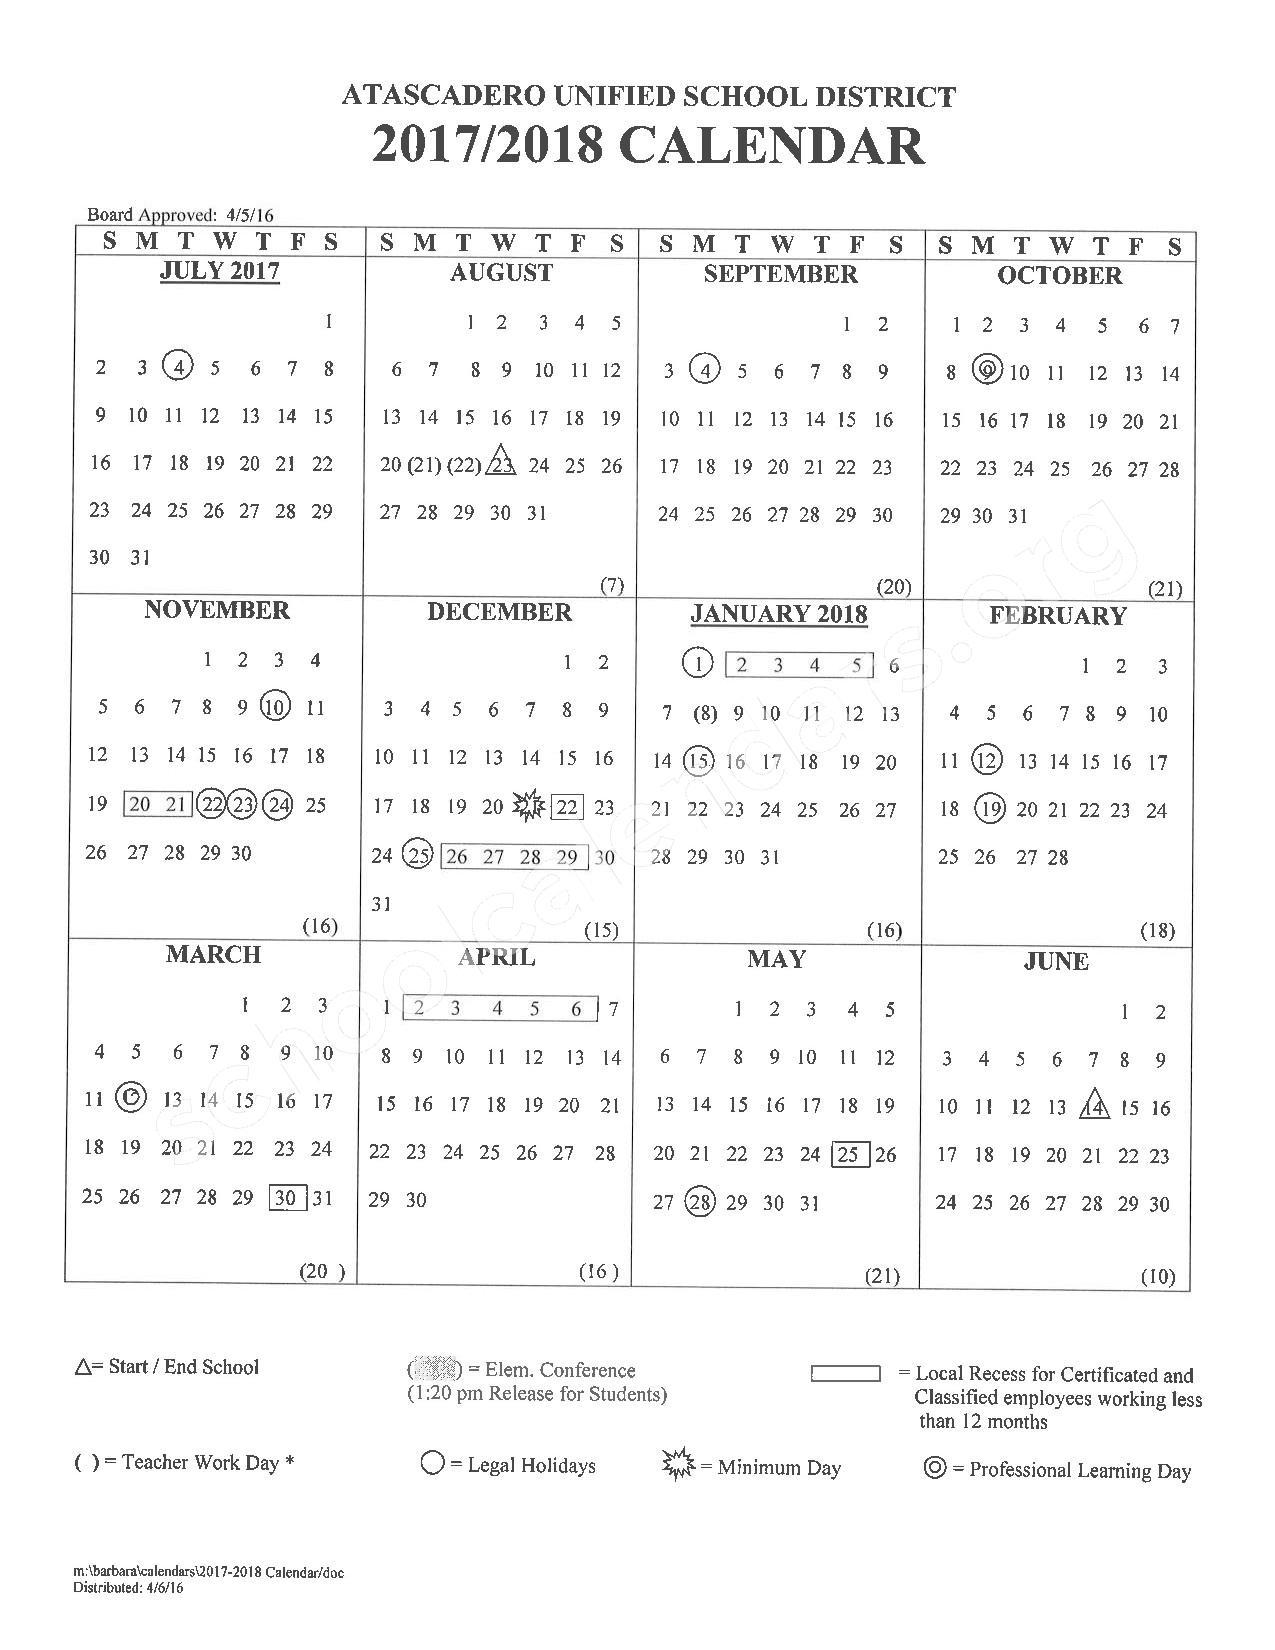 2017 - 2018 School Calendar – Atascadero Unified School District – page 1